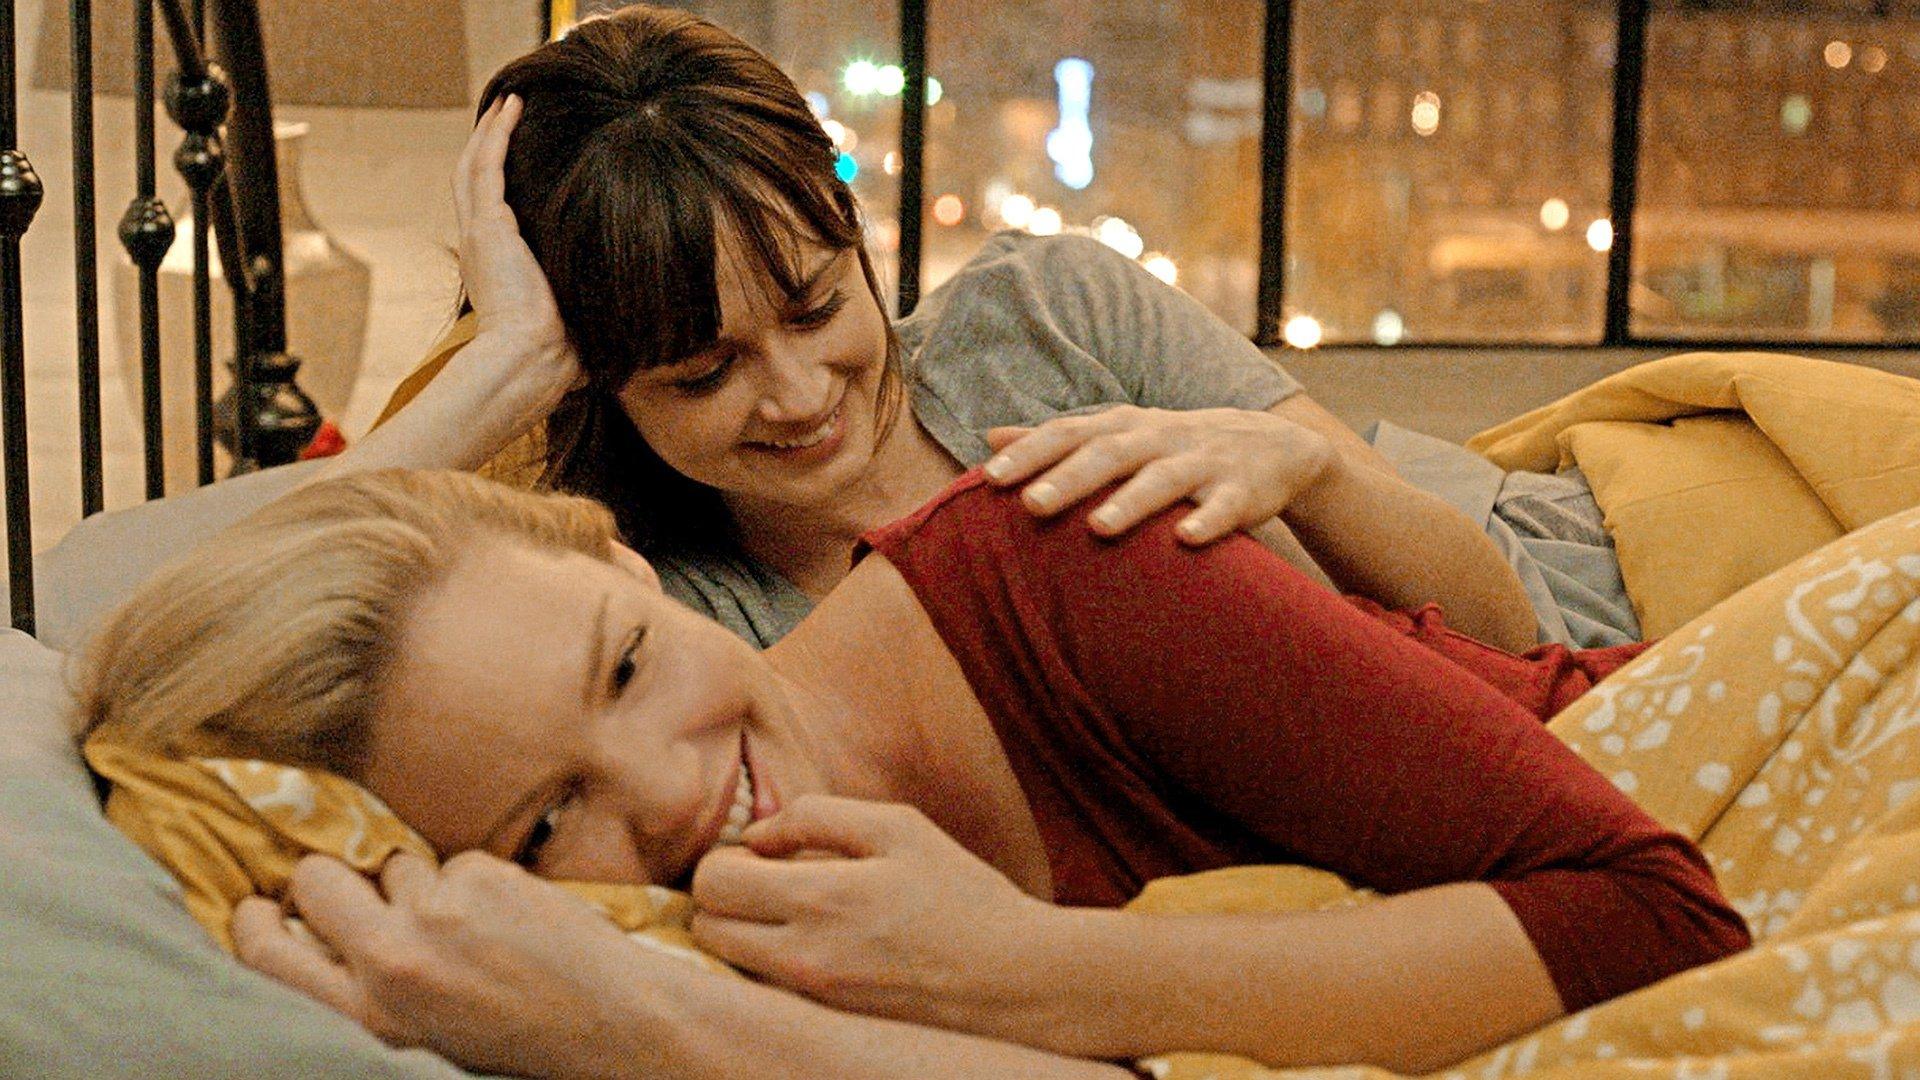 Unacceptable lesbian movie